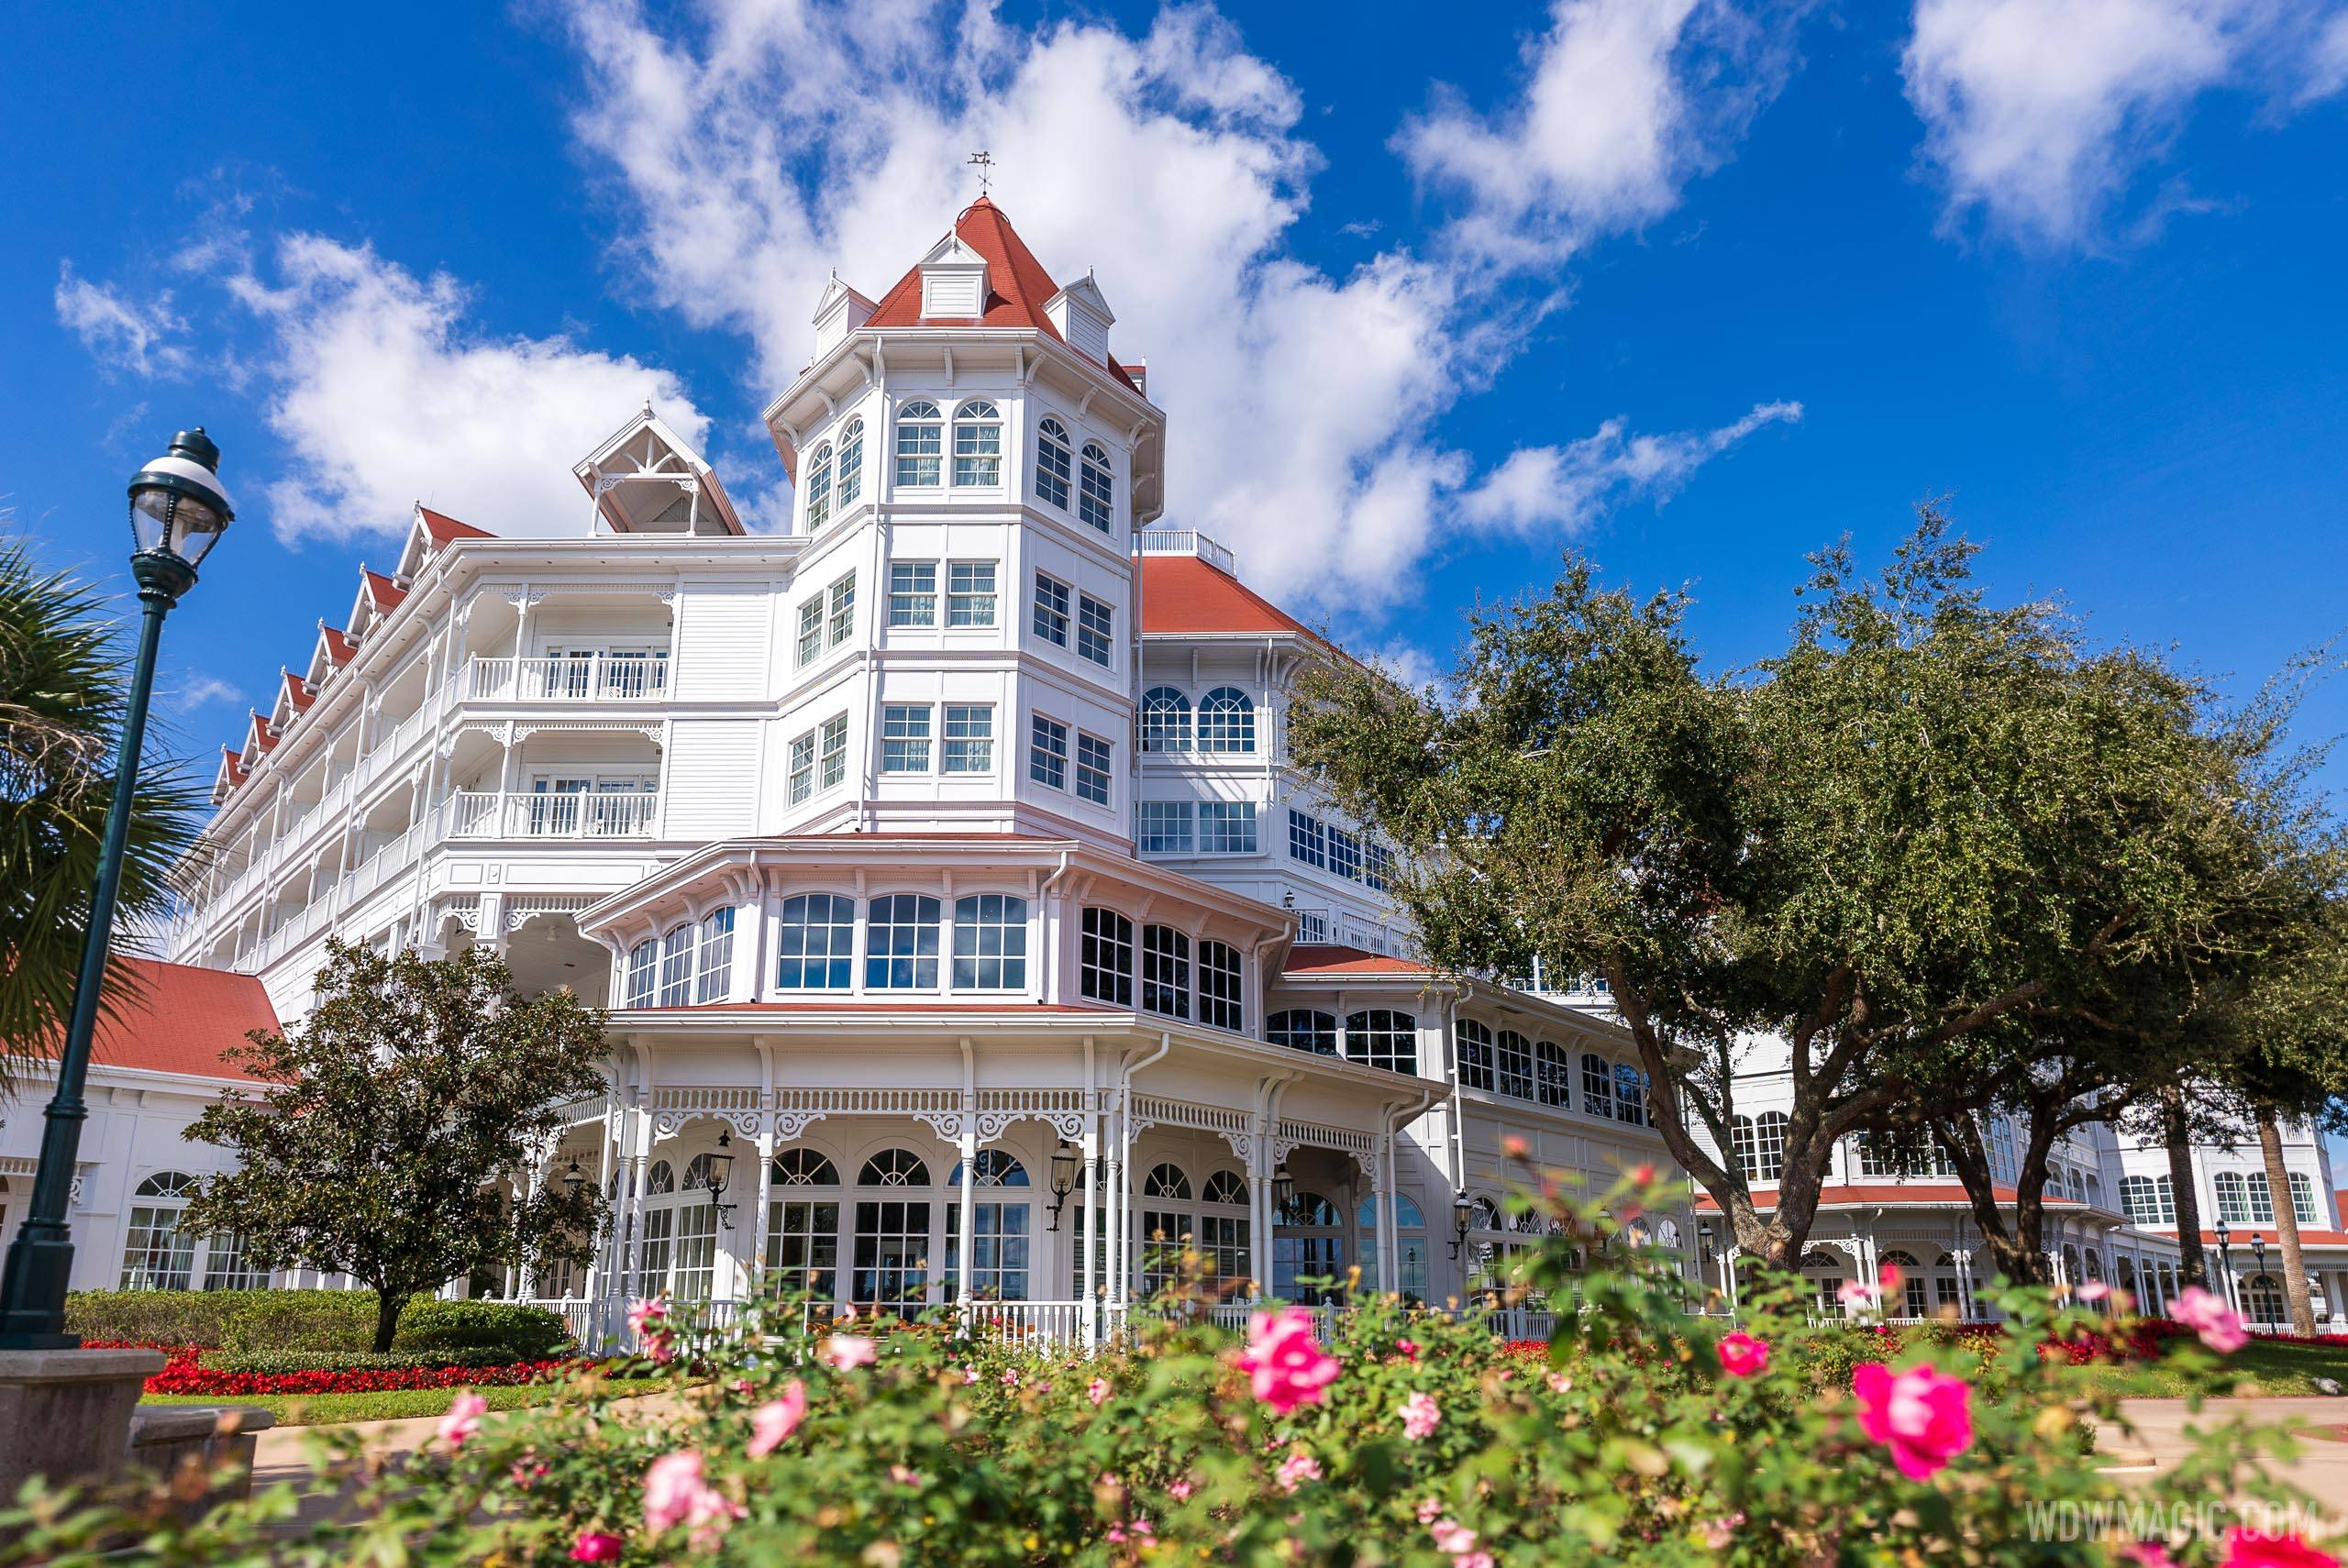 Disney's Grand Floridan Resort overview